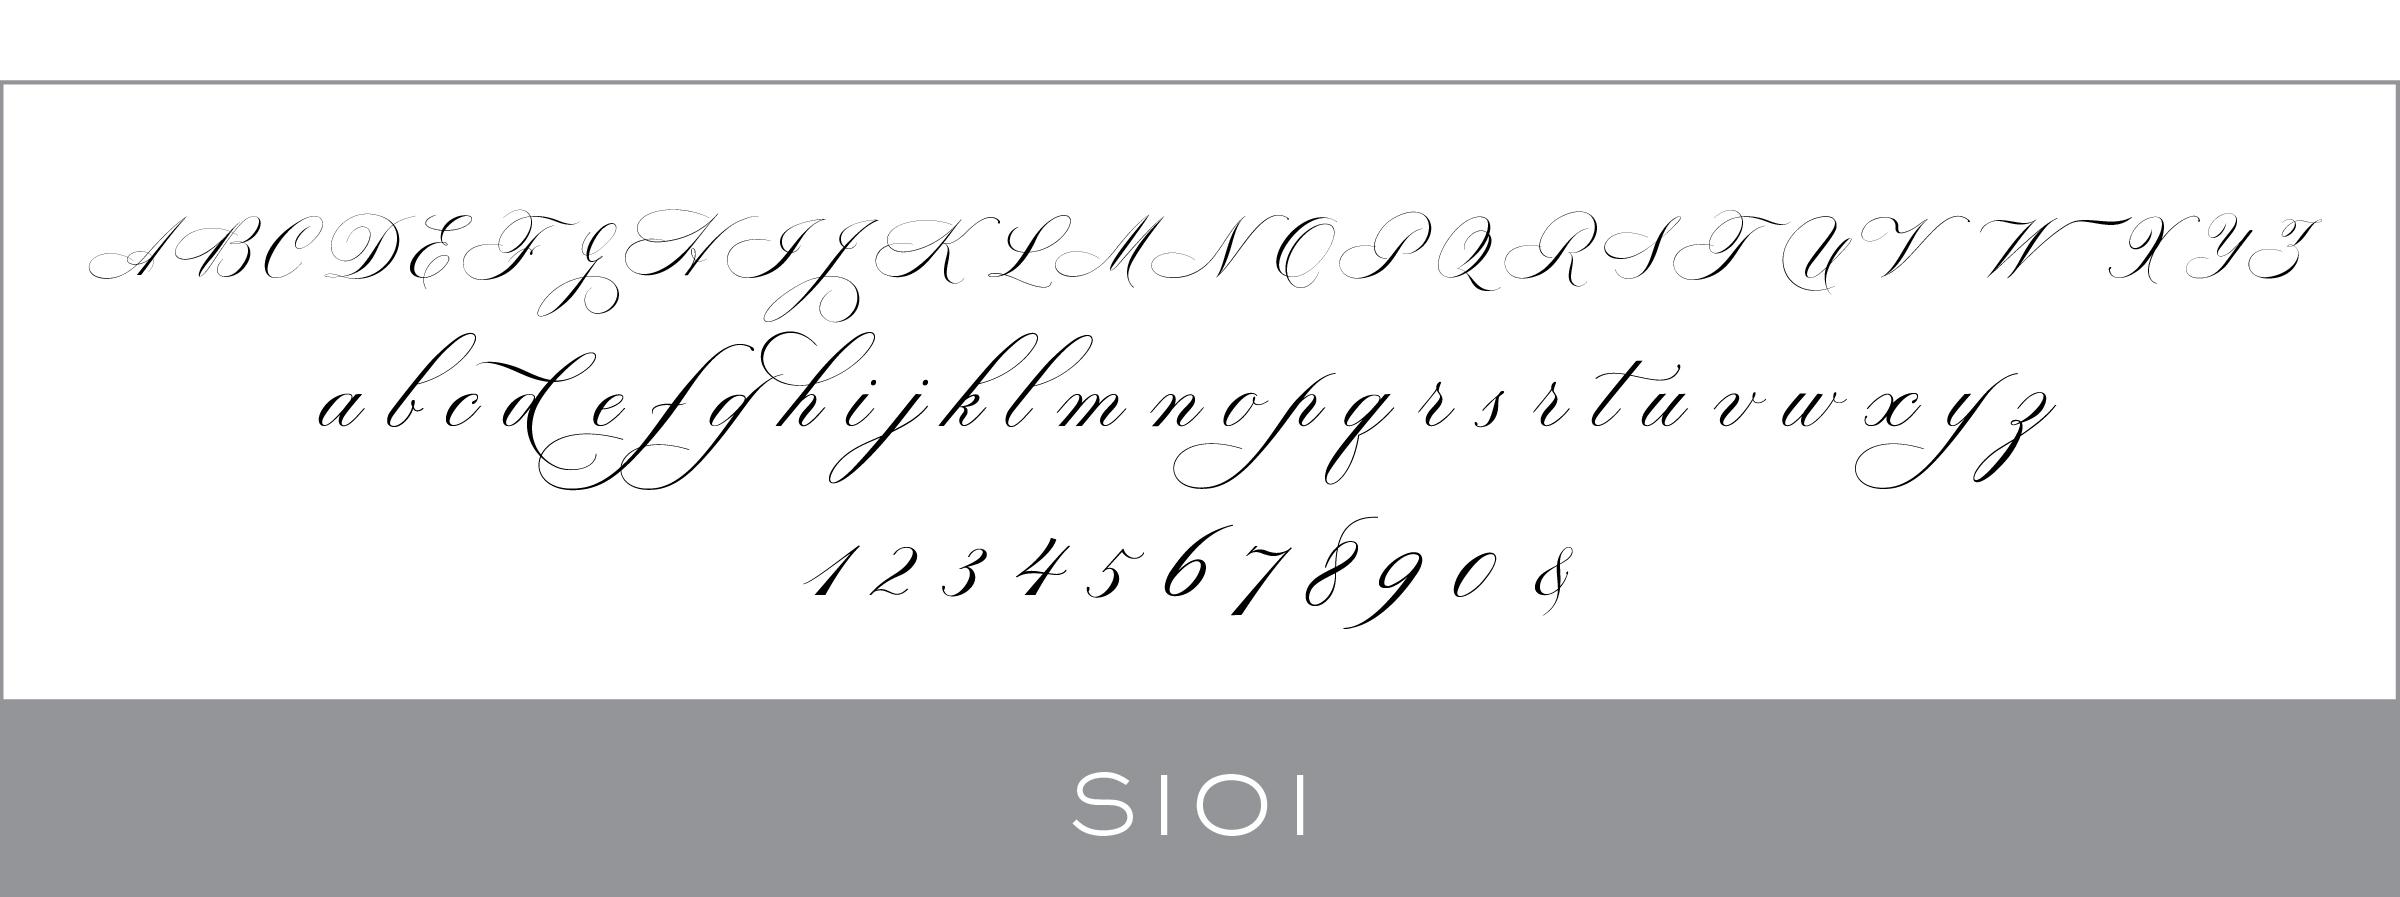 S101_Haute_Papier_Font.jpg